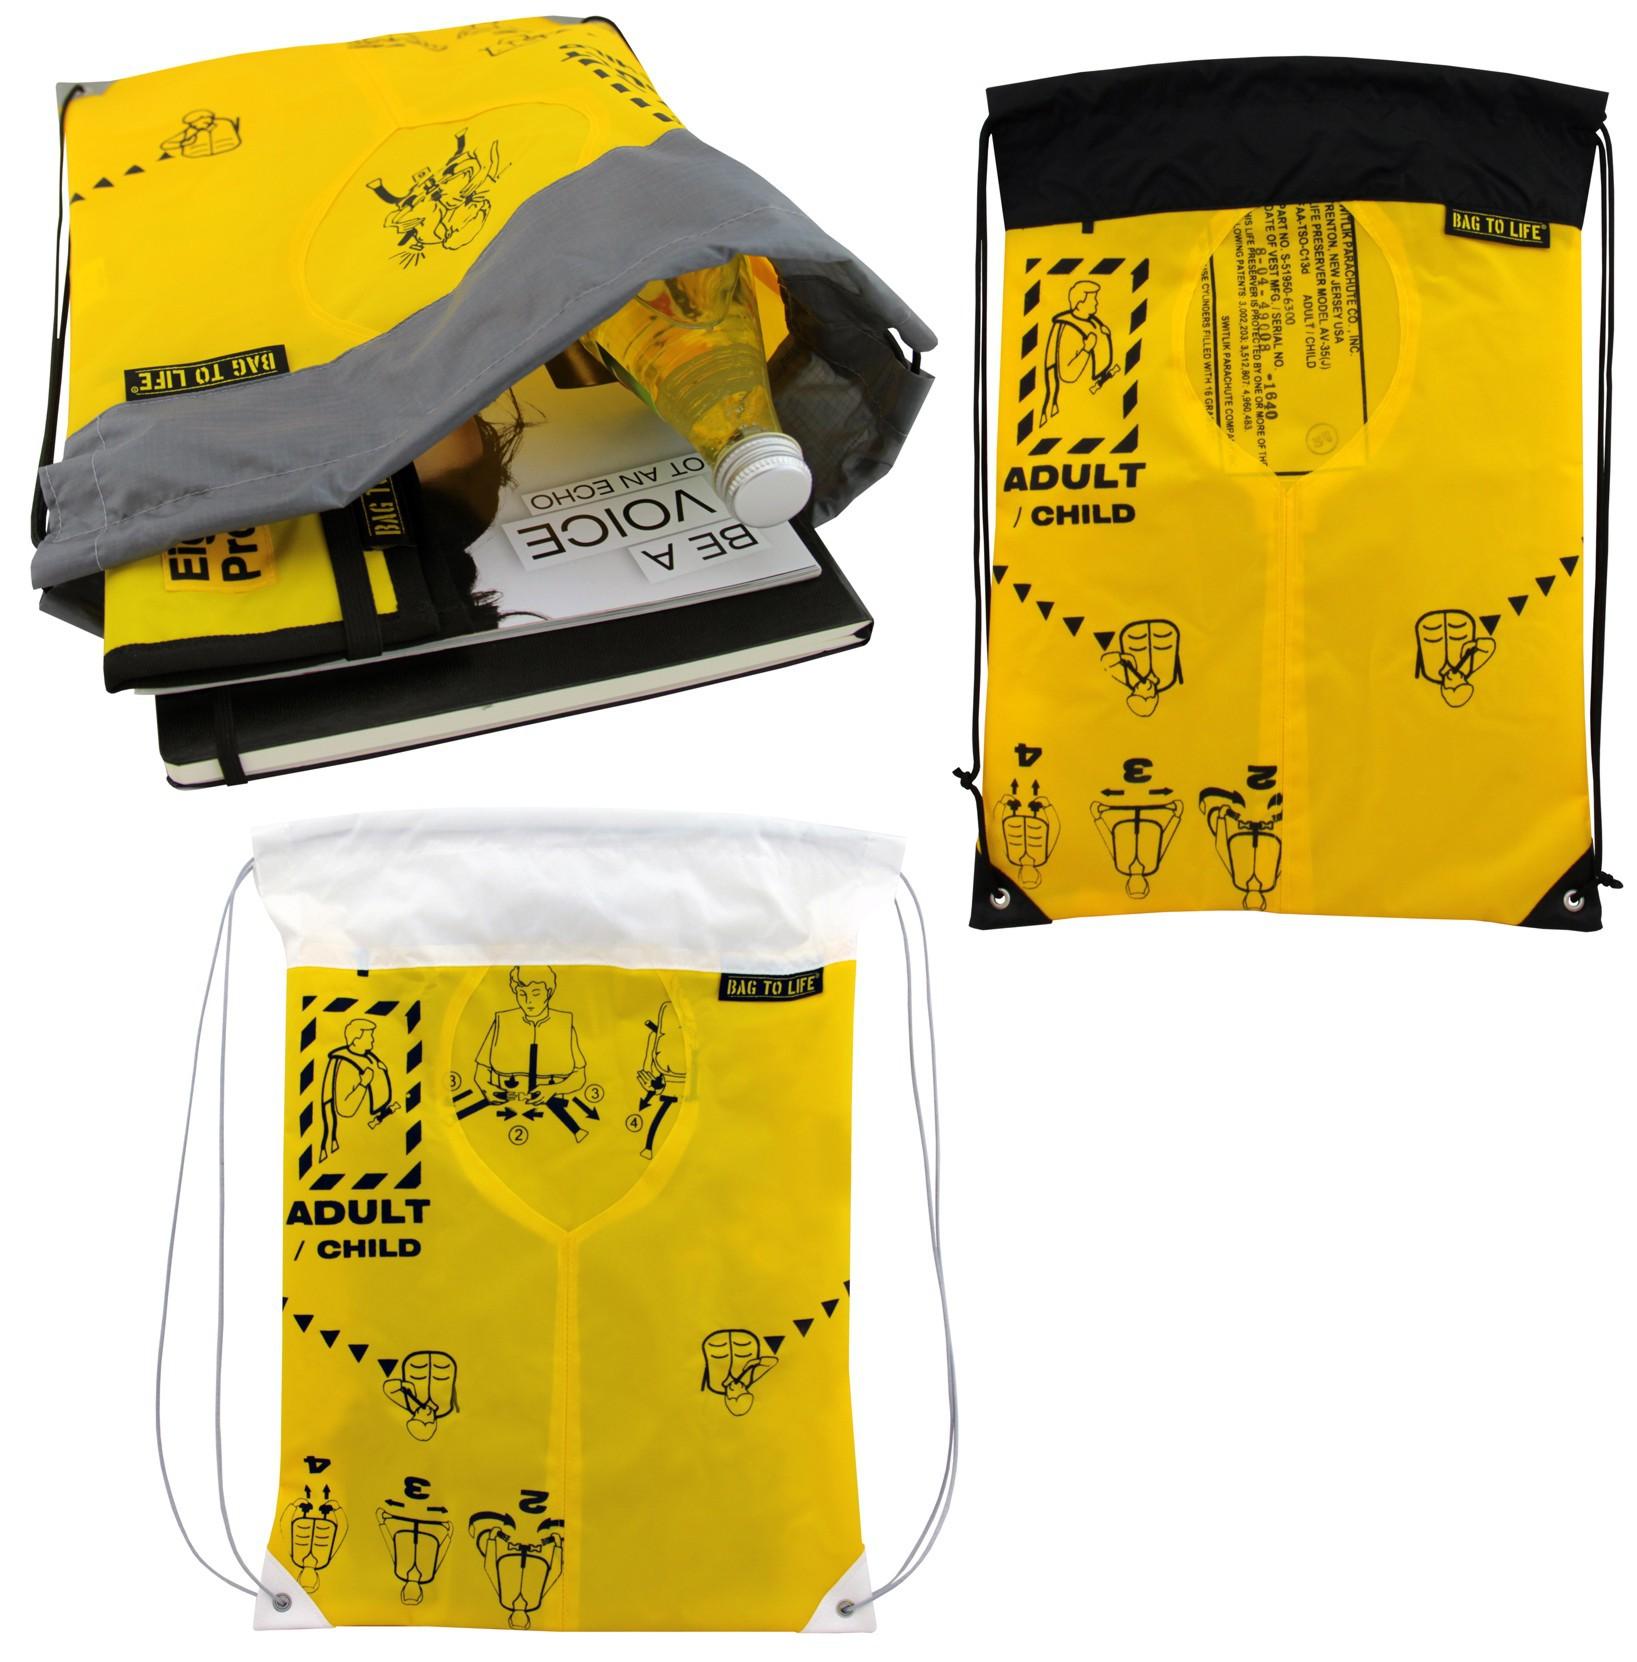 cf2daff190ba1 BAG TO LIFE Sky Gym Bag Turnbeutel Rucksack UNIKAT Upcycling aus einer  Rettungsweste